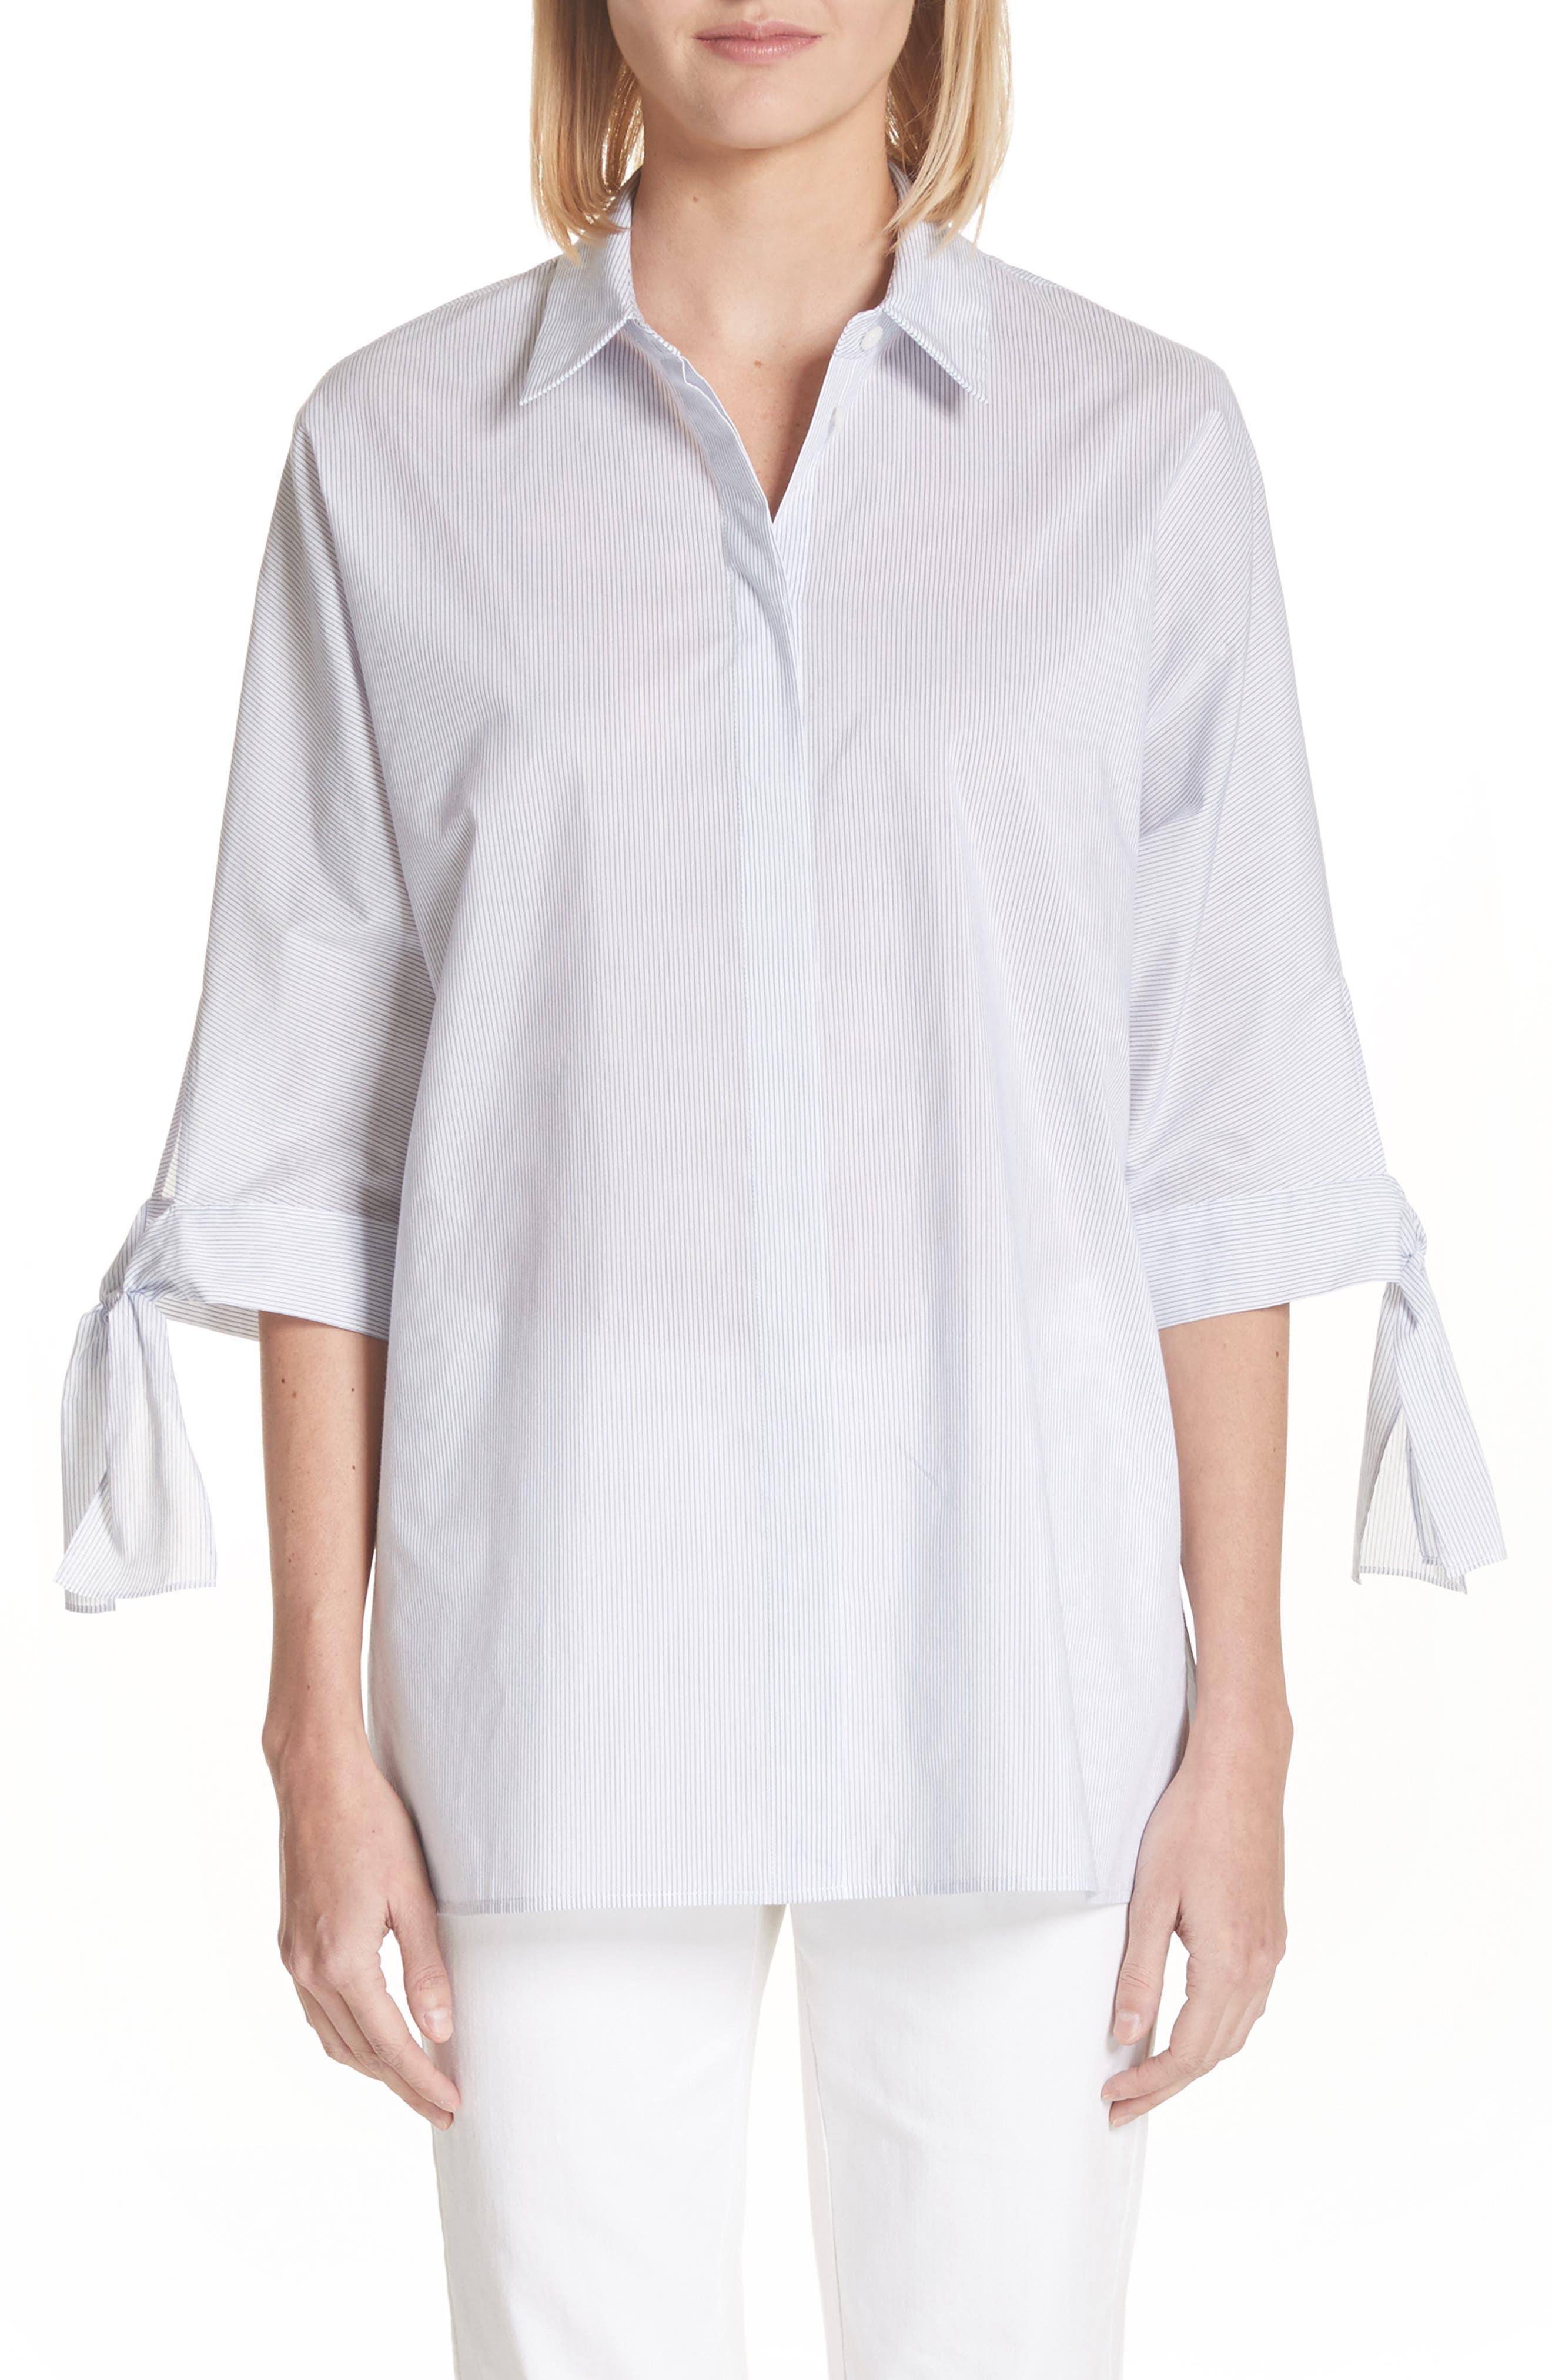 Breezy Stripe Saige Blouse,                             Main thumbnail 1, color,                             White Multi